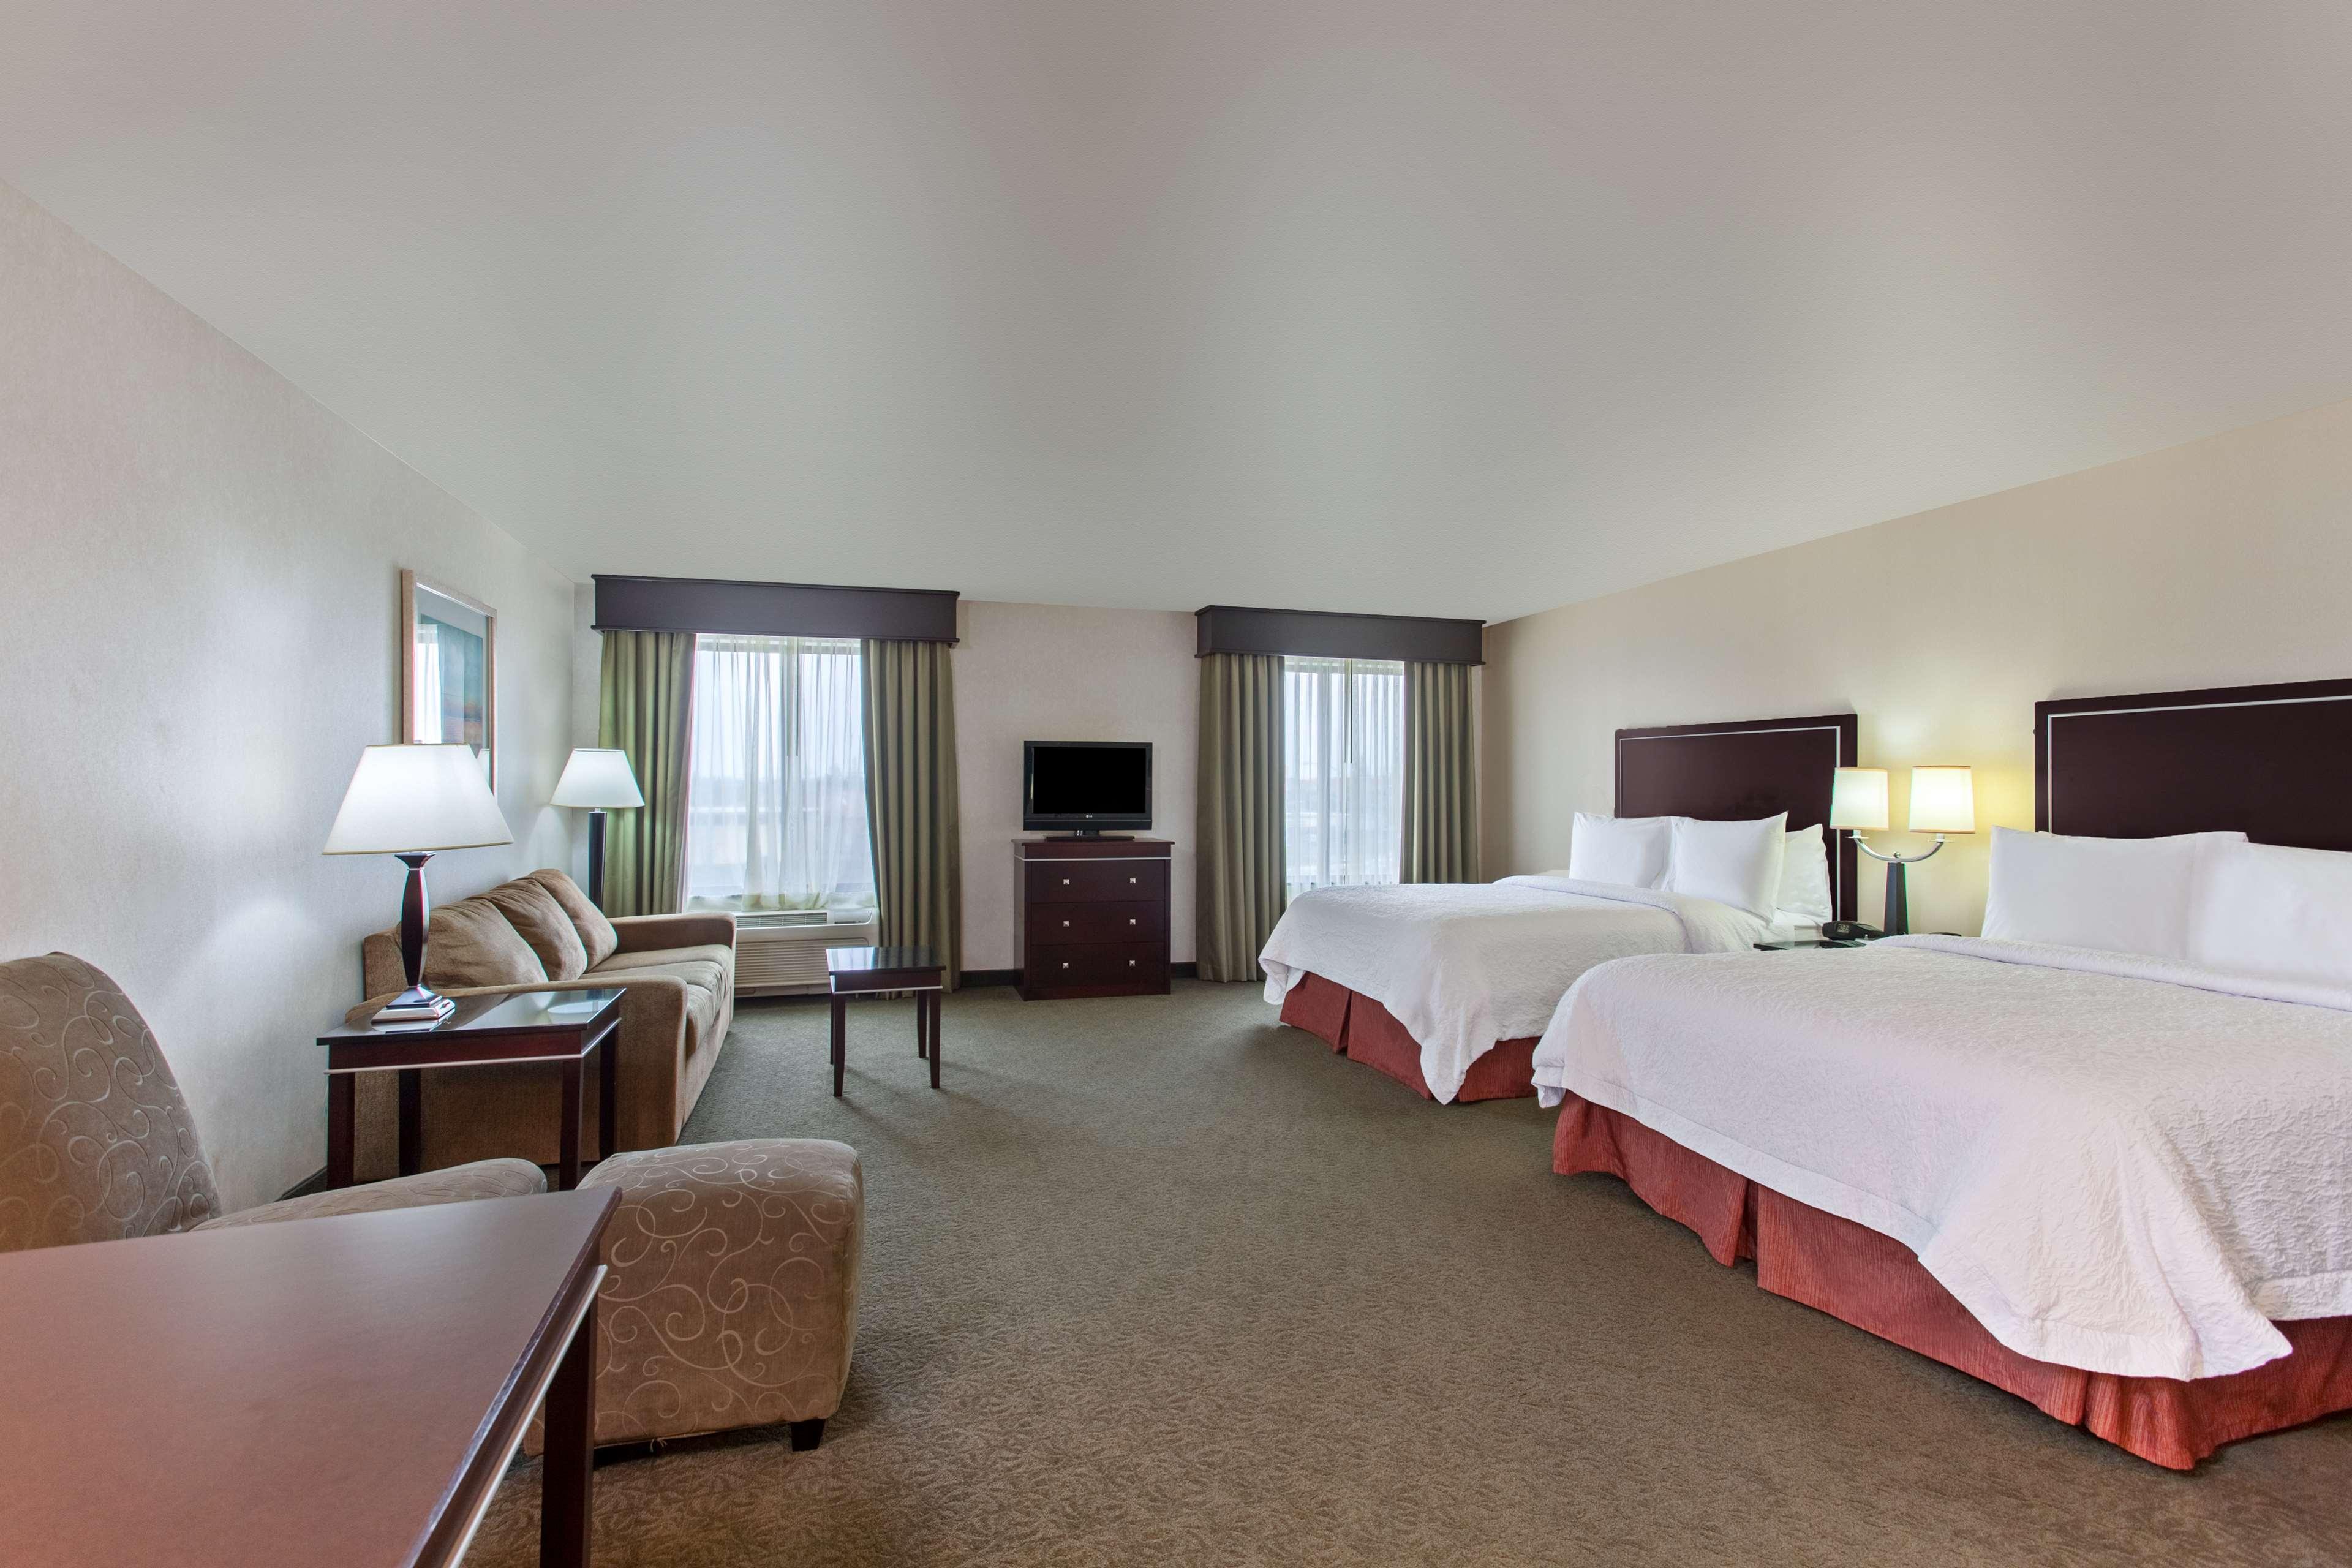 Hampton Inn & Suites Roseville image 9